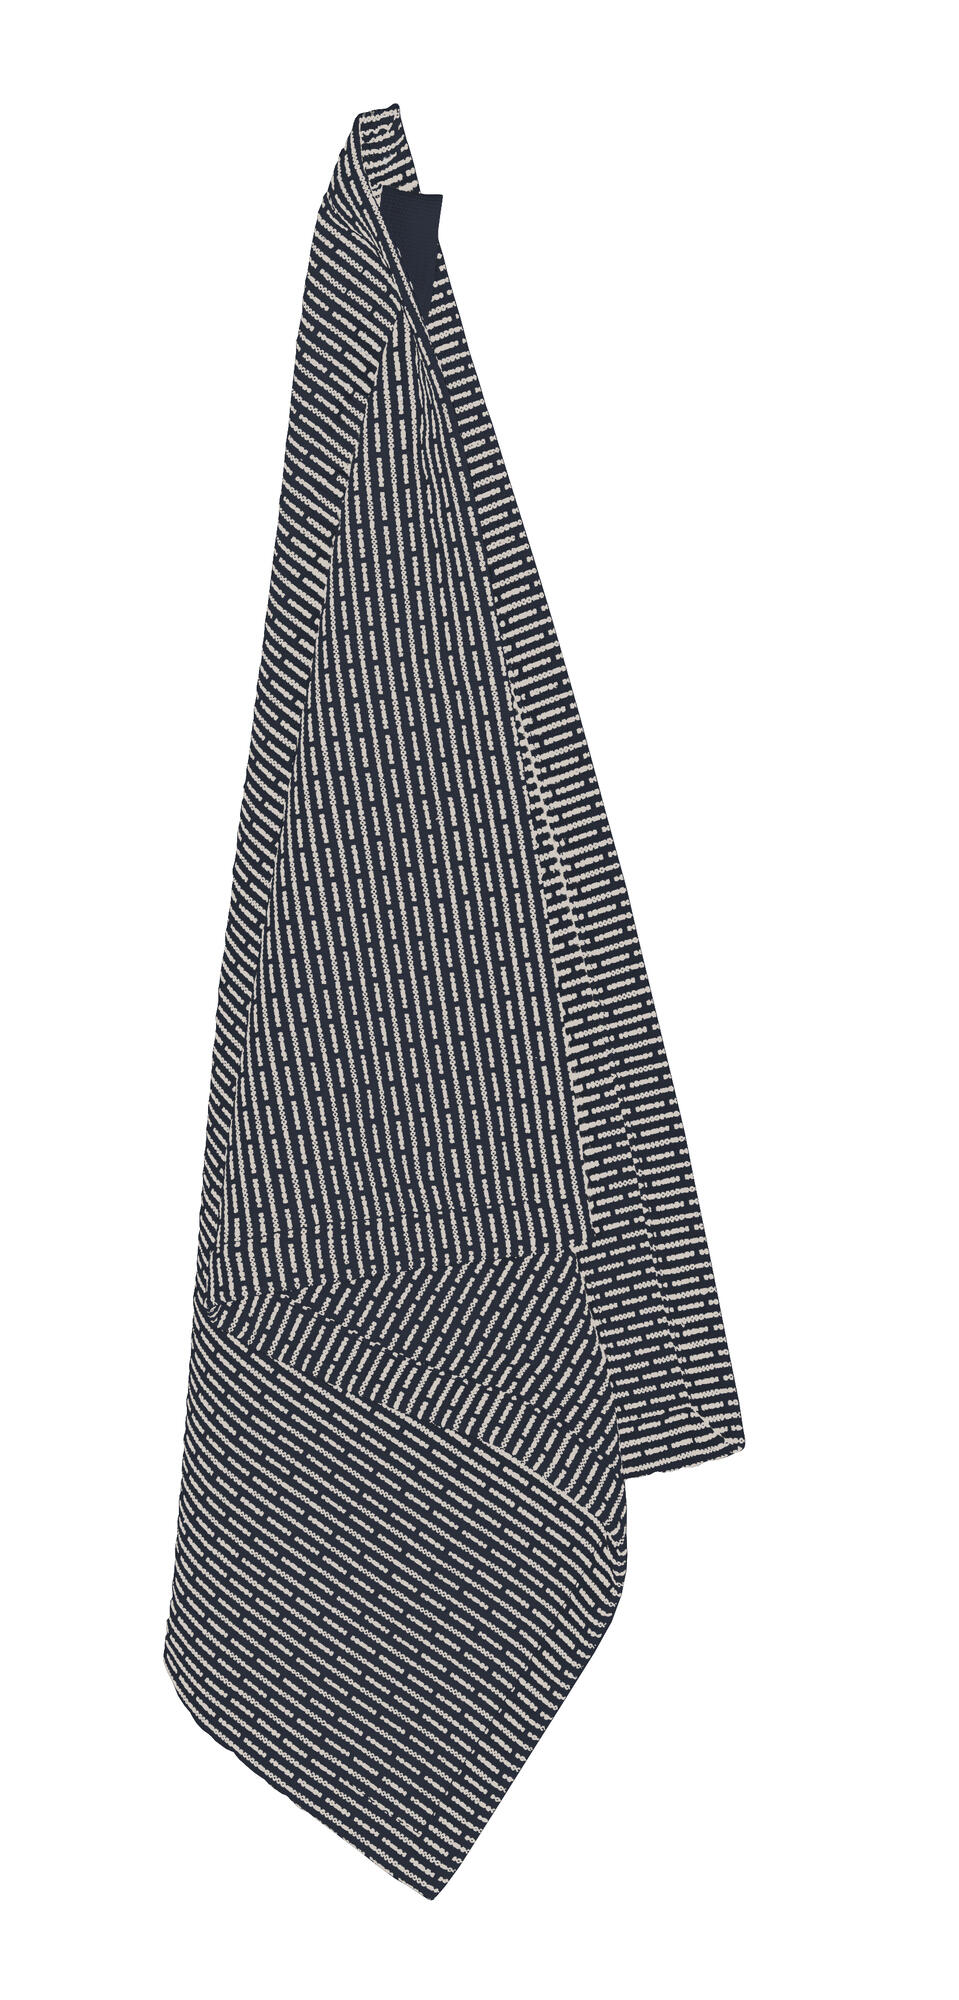 KitchenAndWashCloth-DarkblueStone-Hanging-1048-550-LR